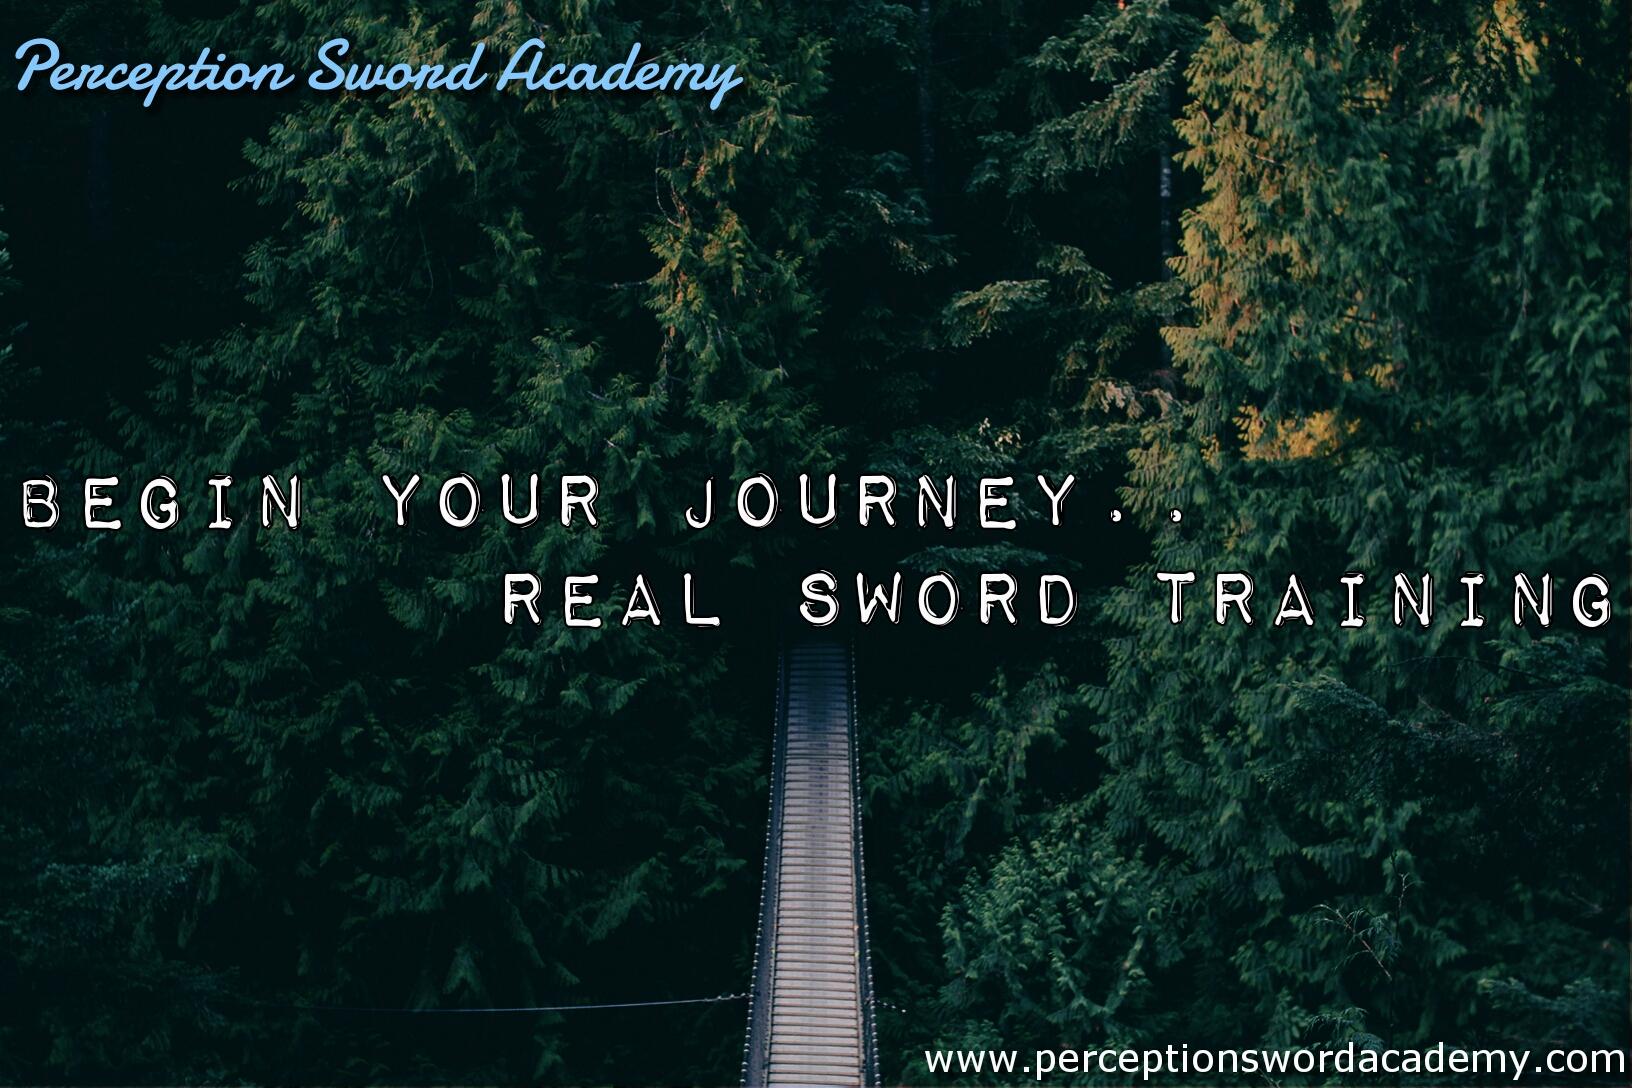 Perception Sword Academy Inspiration 3